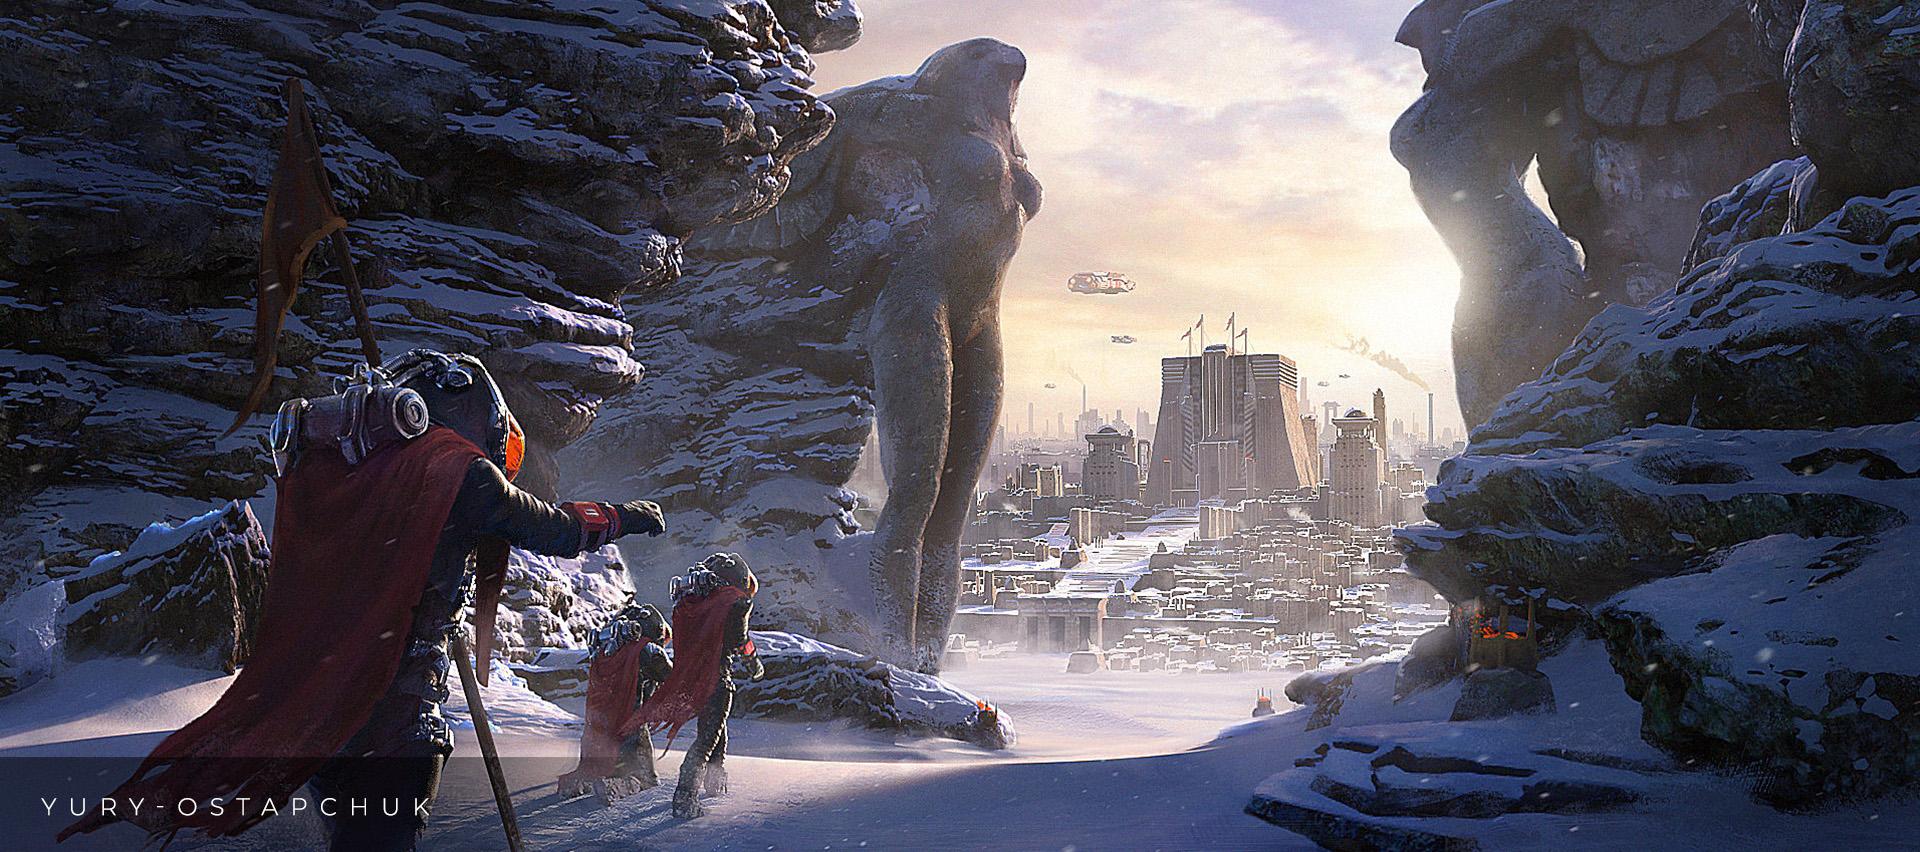 8yury-ostapchuk-yury-ostapchuk-yury-ostapchuk-scene-rocks-snow-statues-sunset-05.jpg